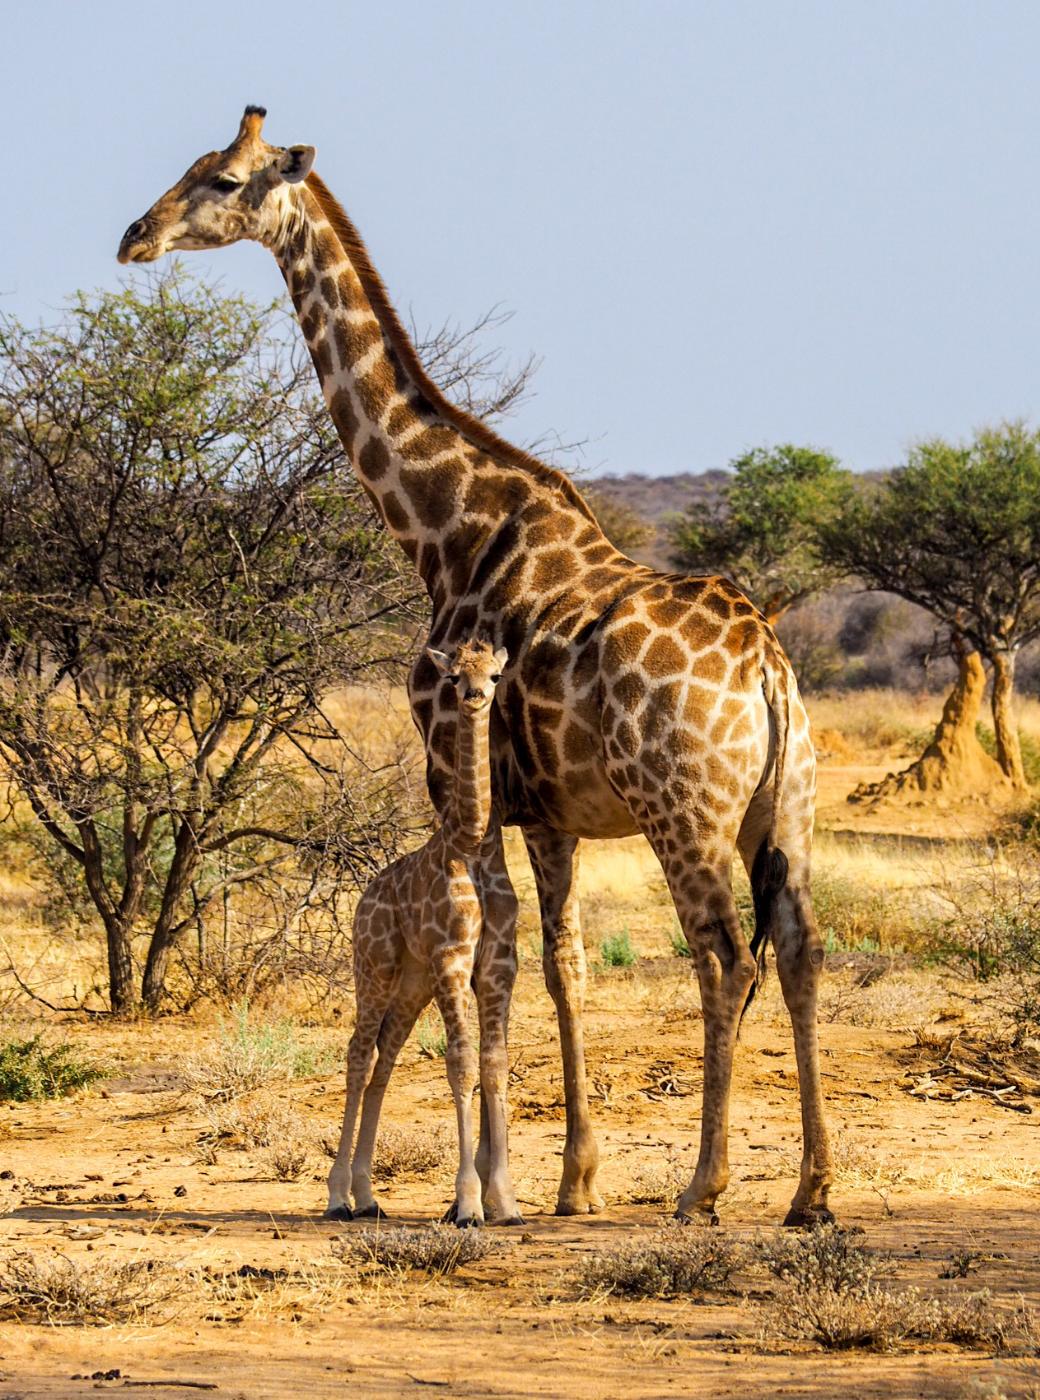 Okonjima Nature Reserve, Namibia